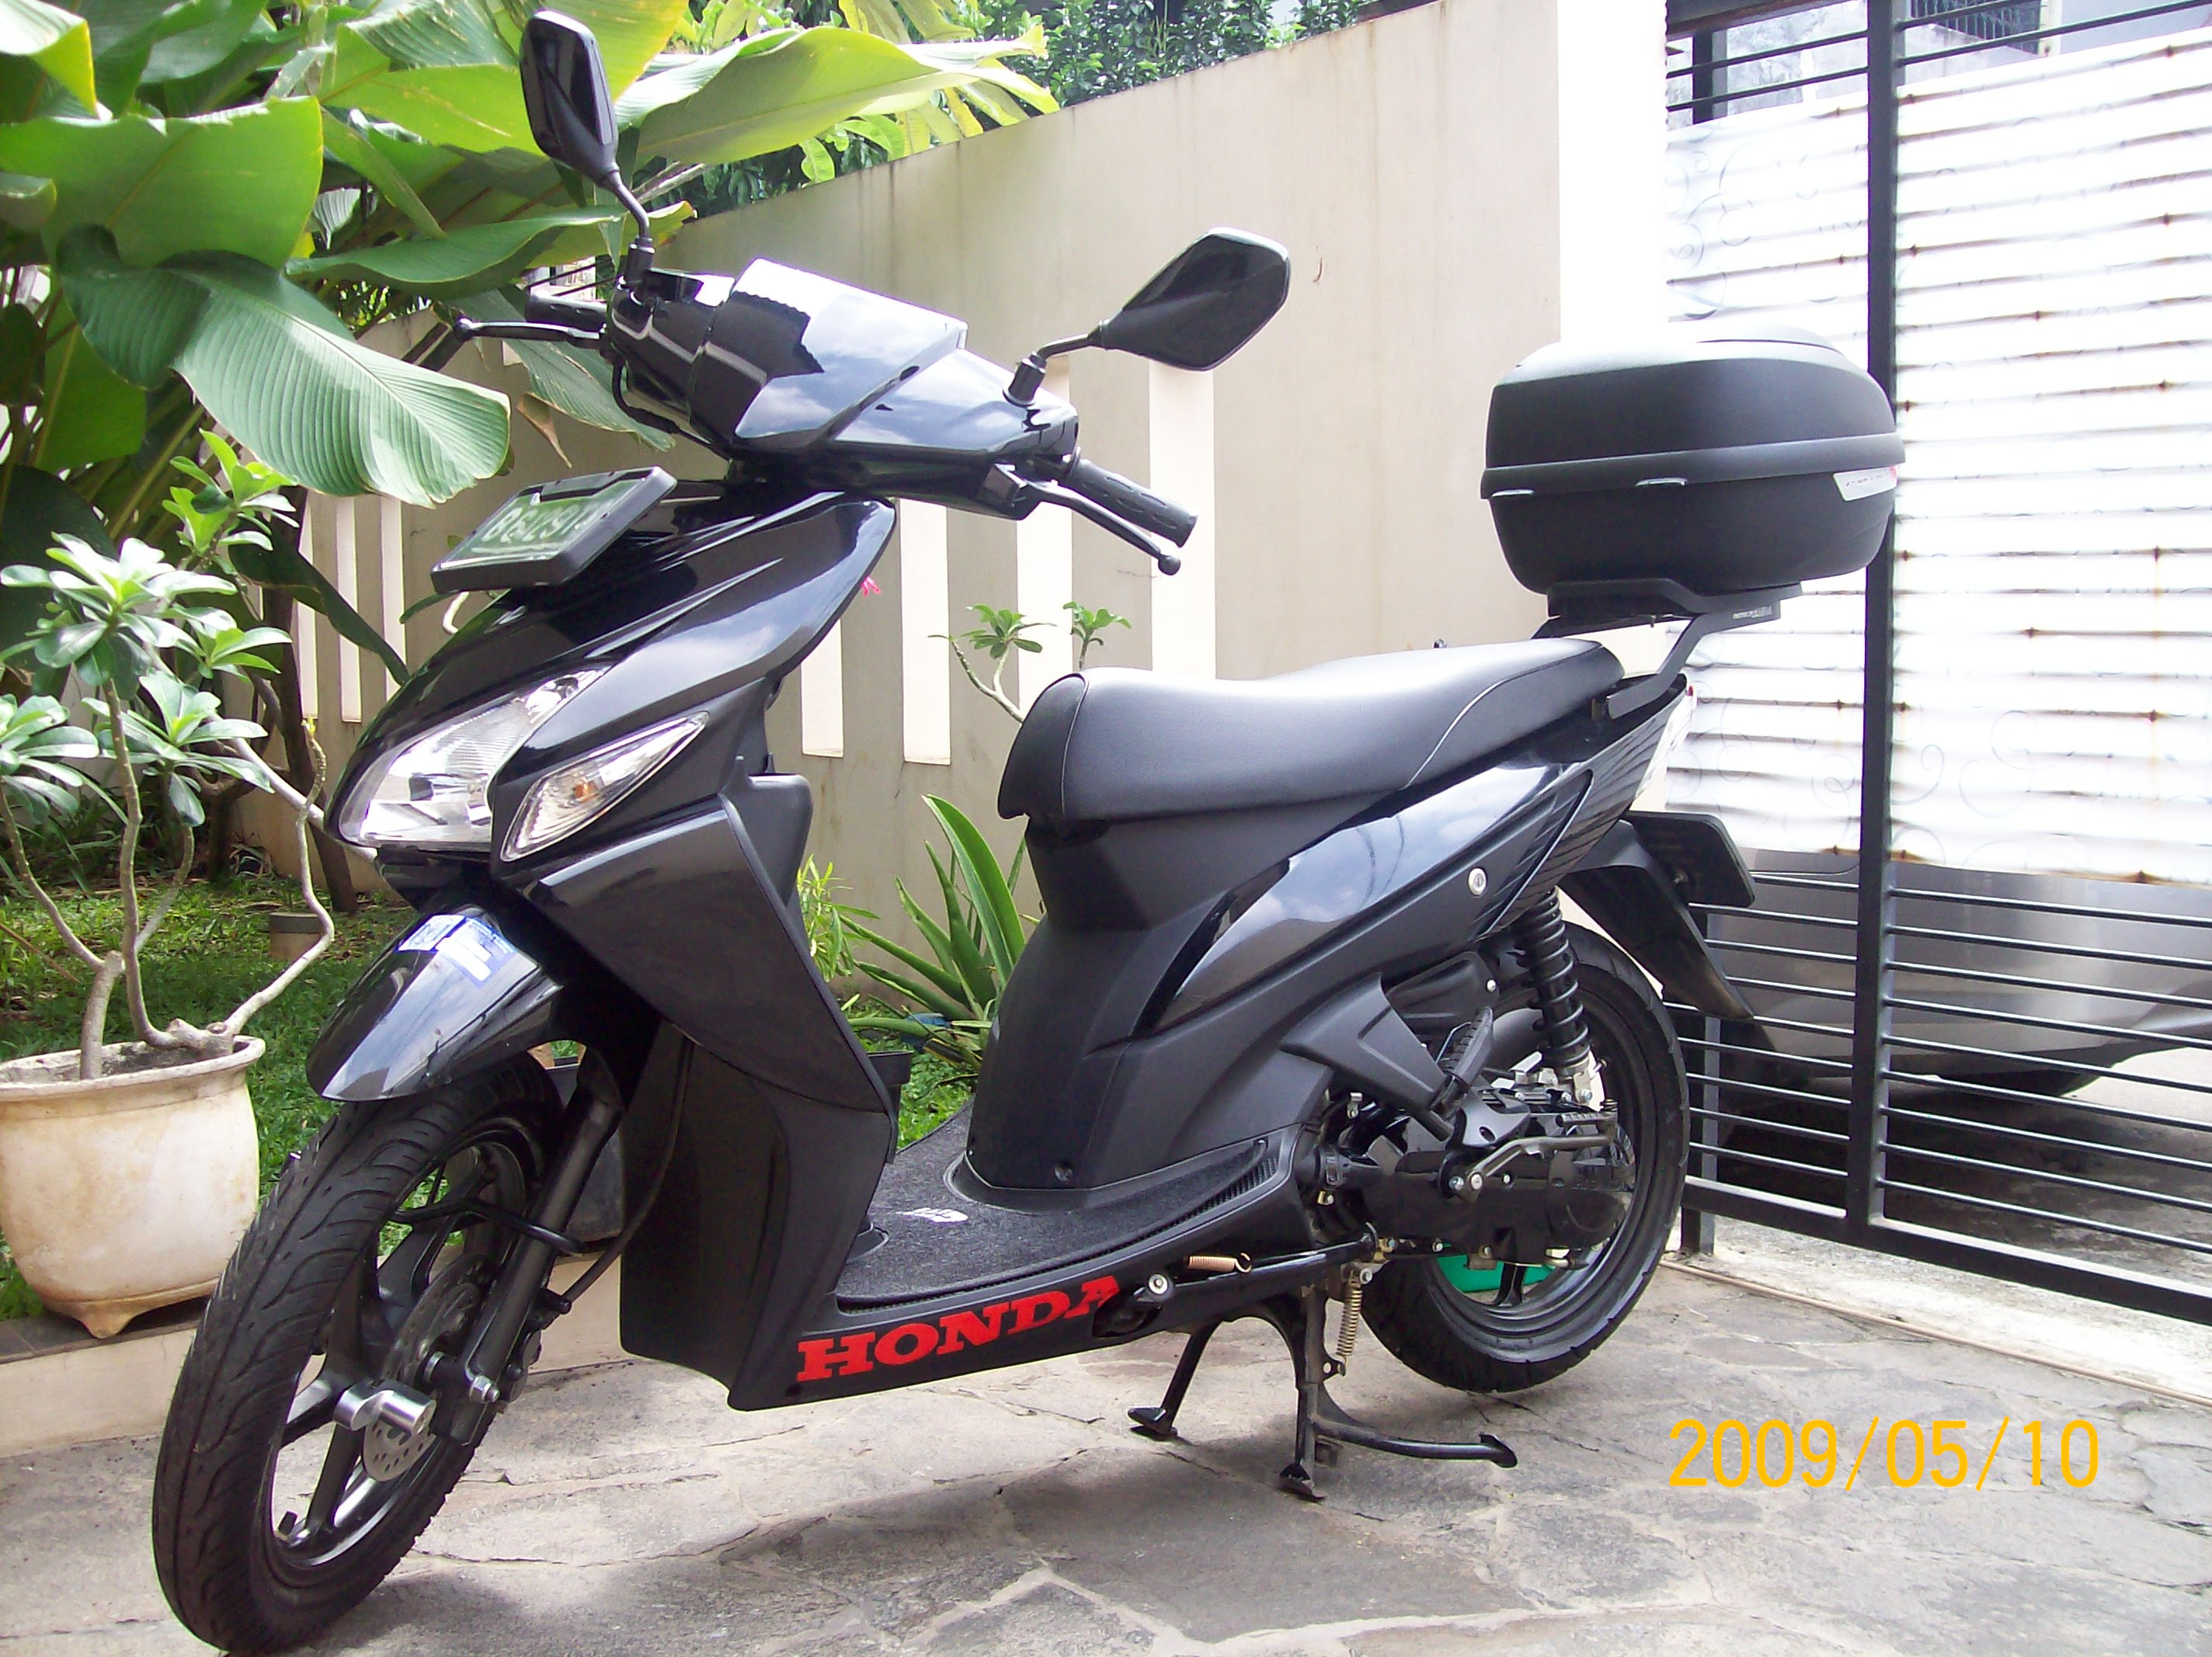 Bengkel Modifikasi Vario 125 Jakarta Lampak Modifikasi